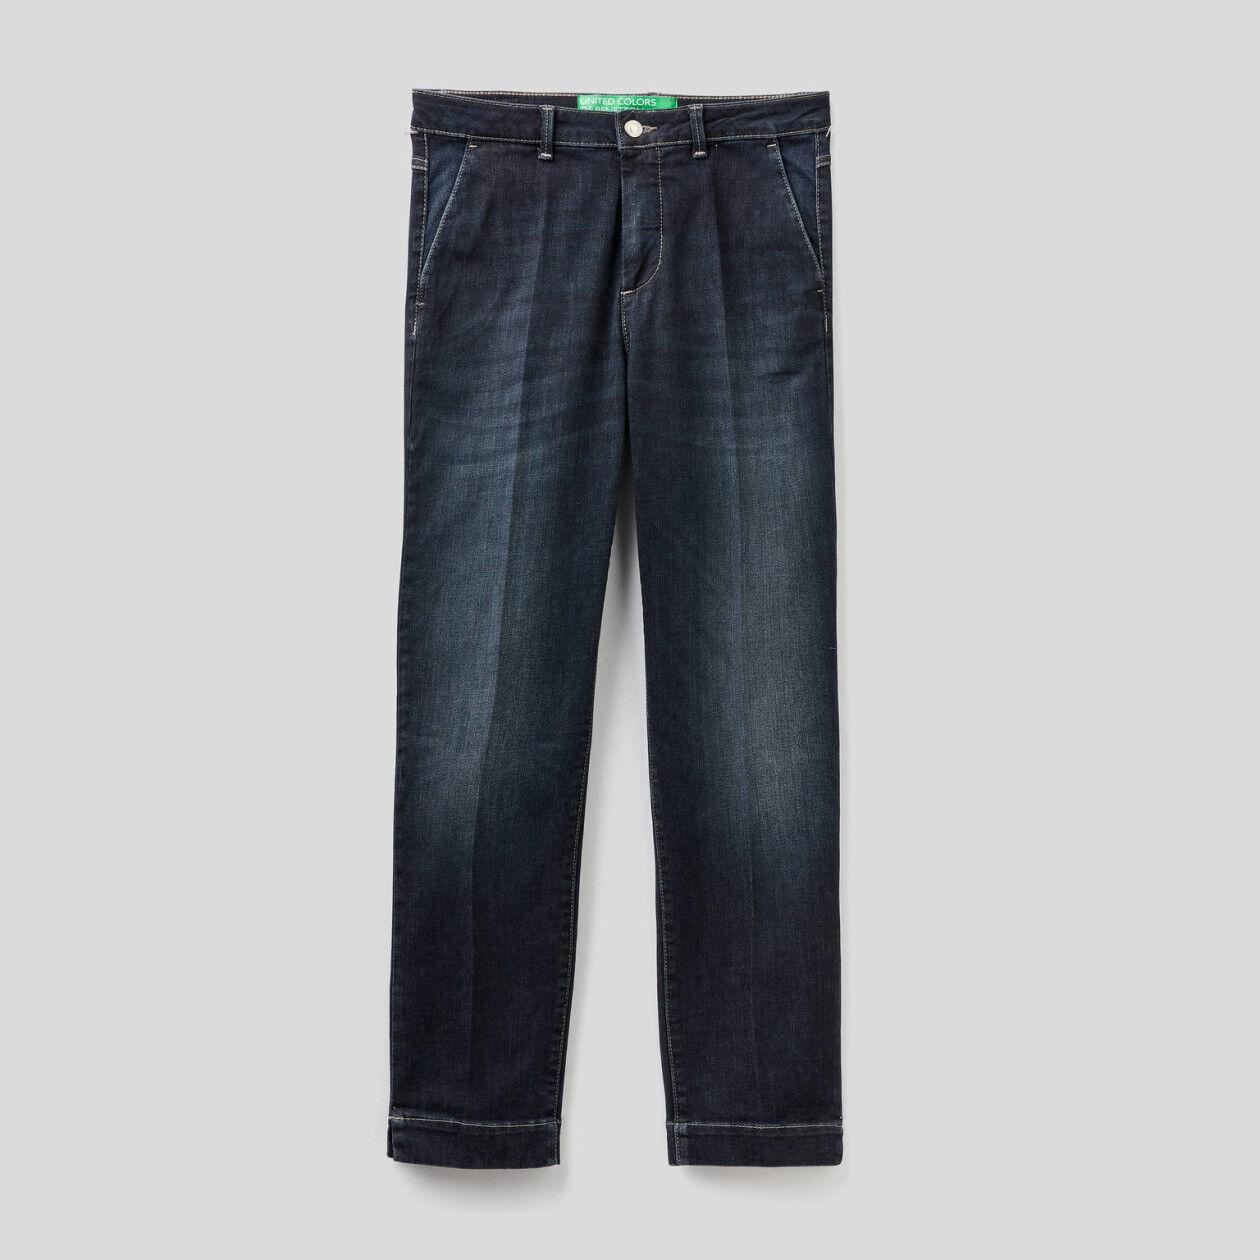 Chino de jeans slim fit